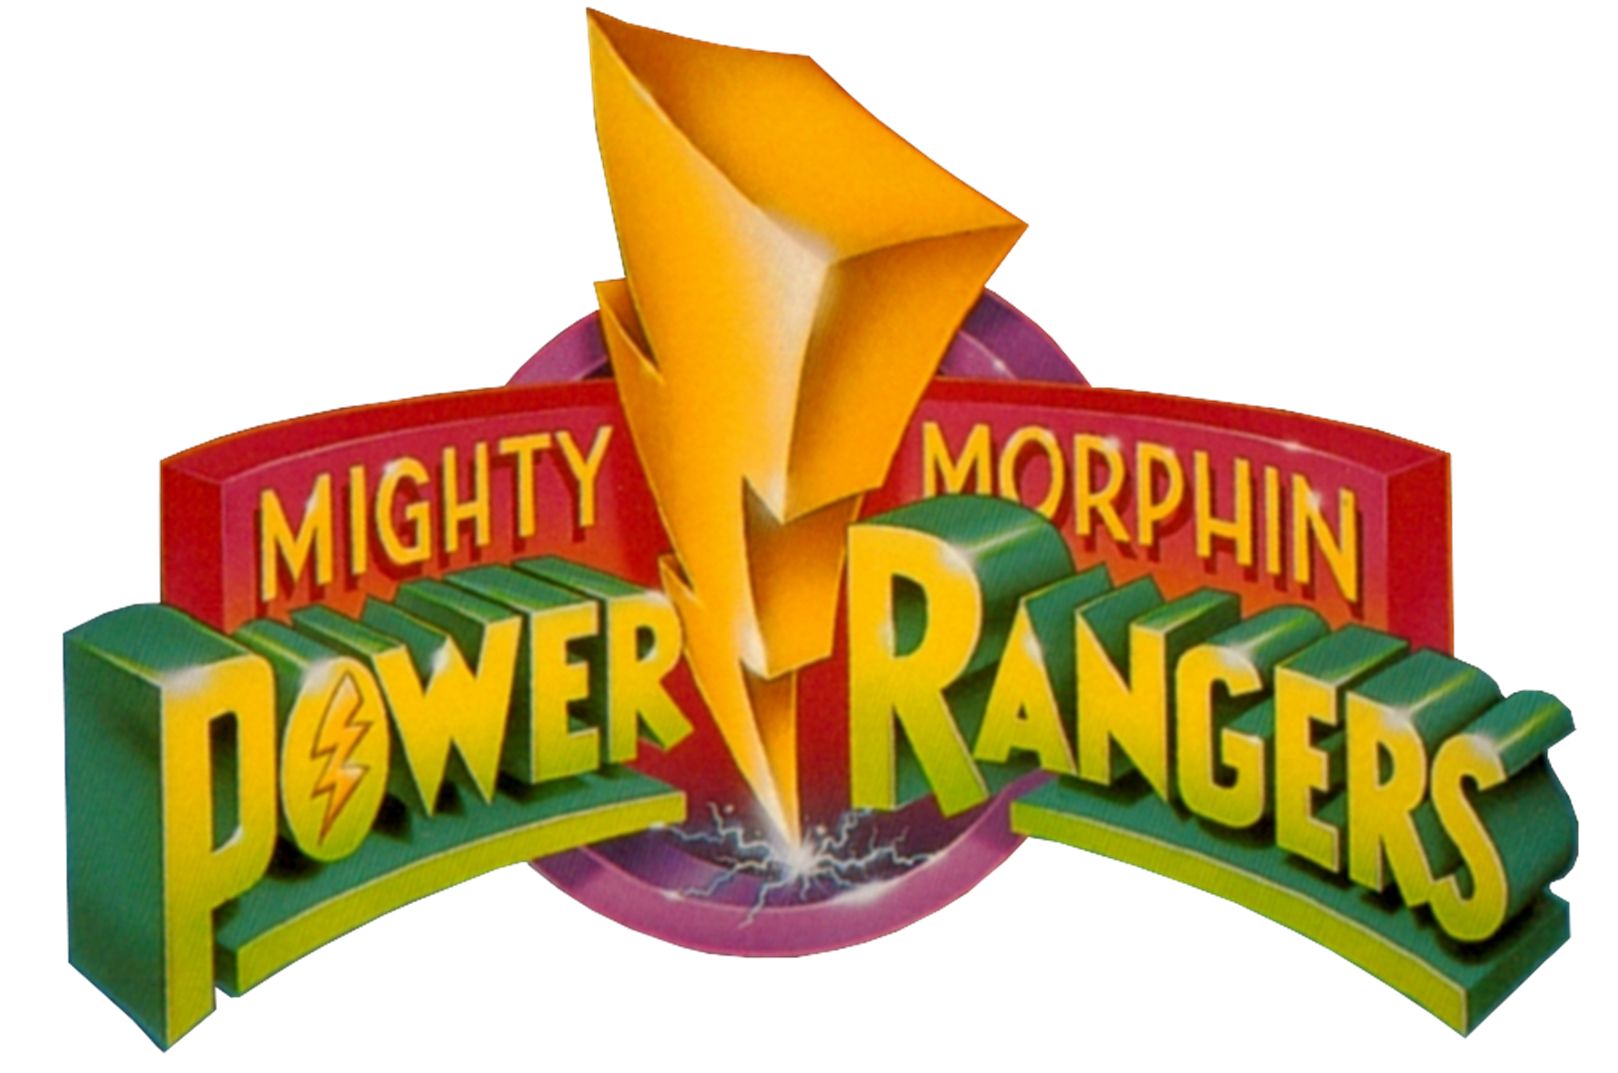 Power rangers logo png clipart jpg freeuse library Mighty Morphin Power Rangers (Season 1) | RangerWiki | Fandom ... jpg freeuse library